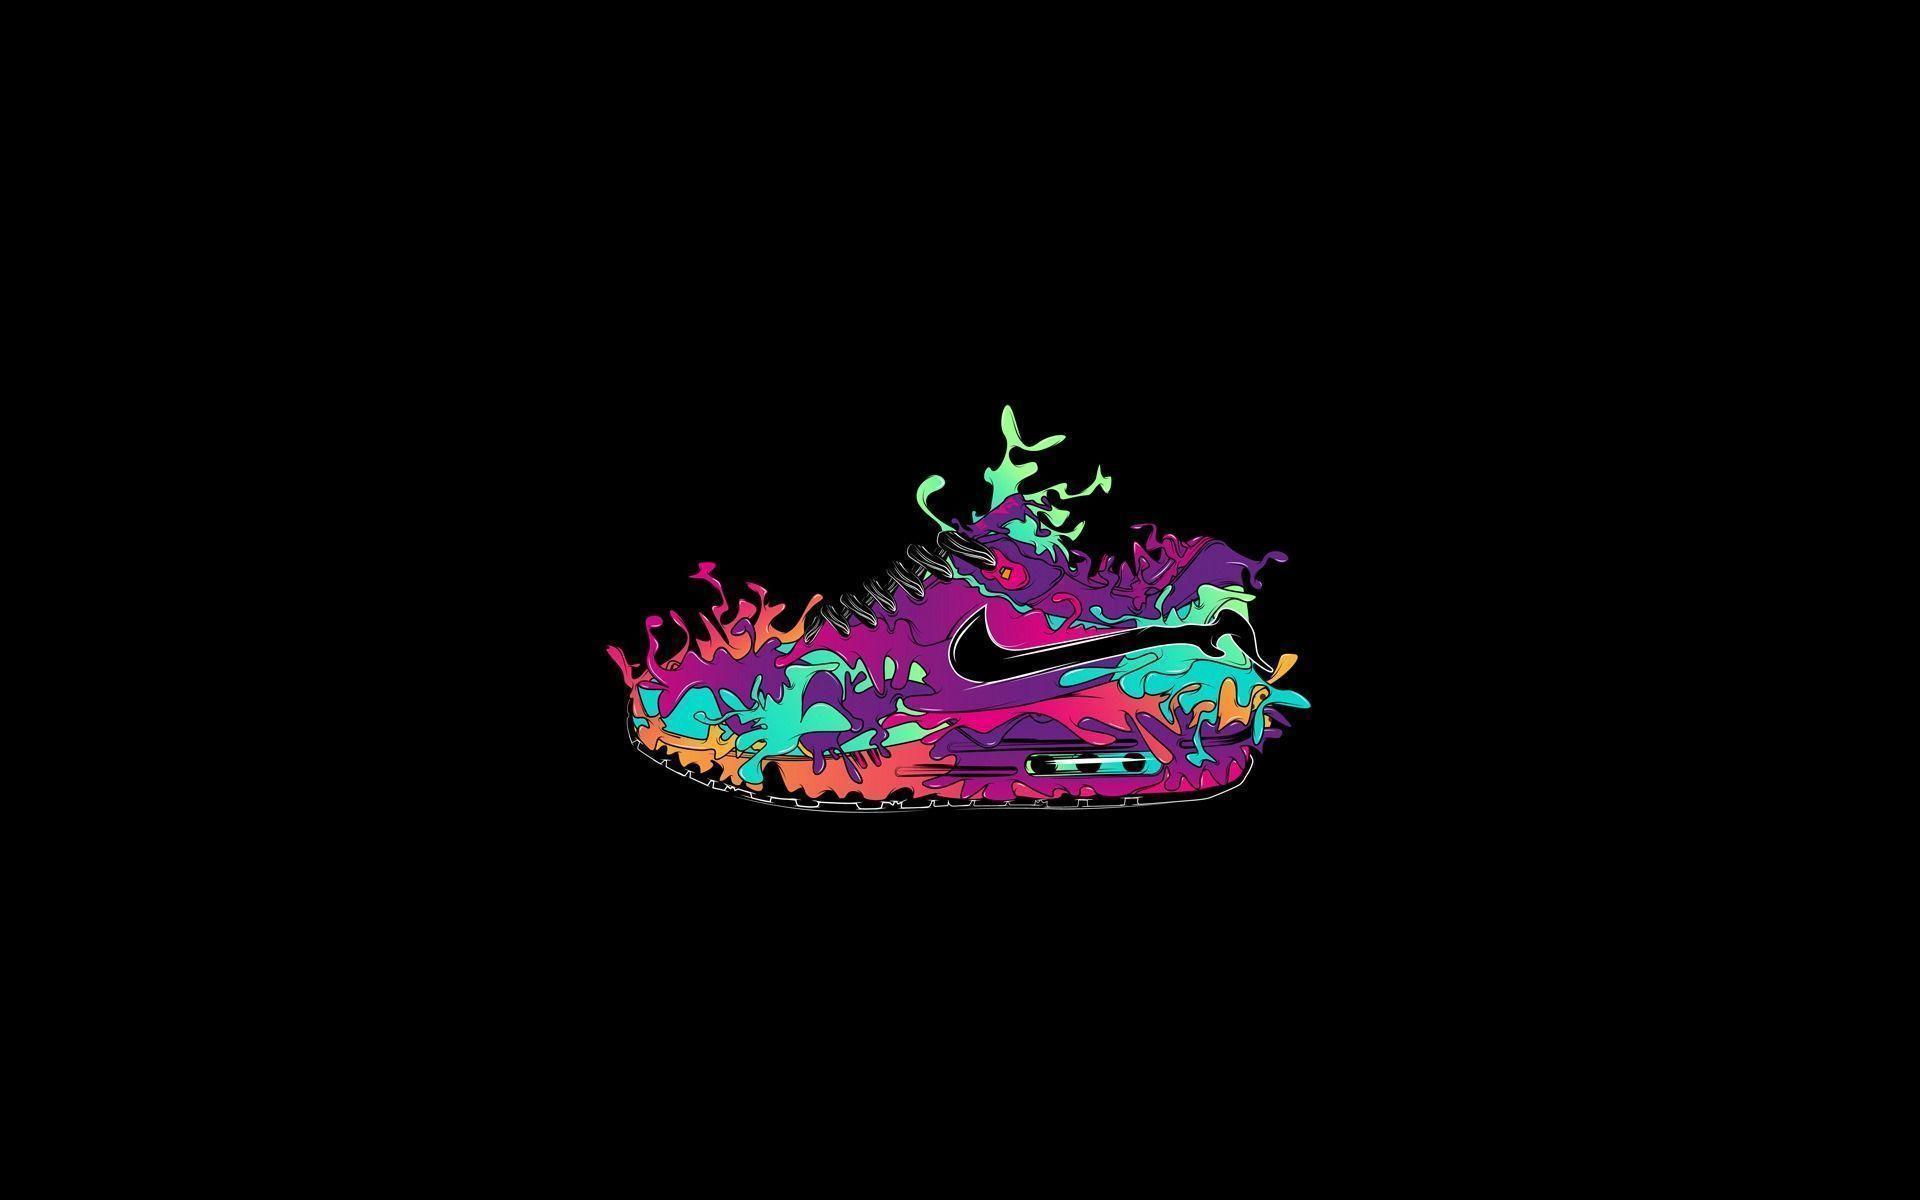 Mininalism Nike Creative Design Wallpaper Hd Poster